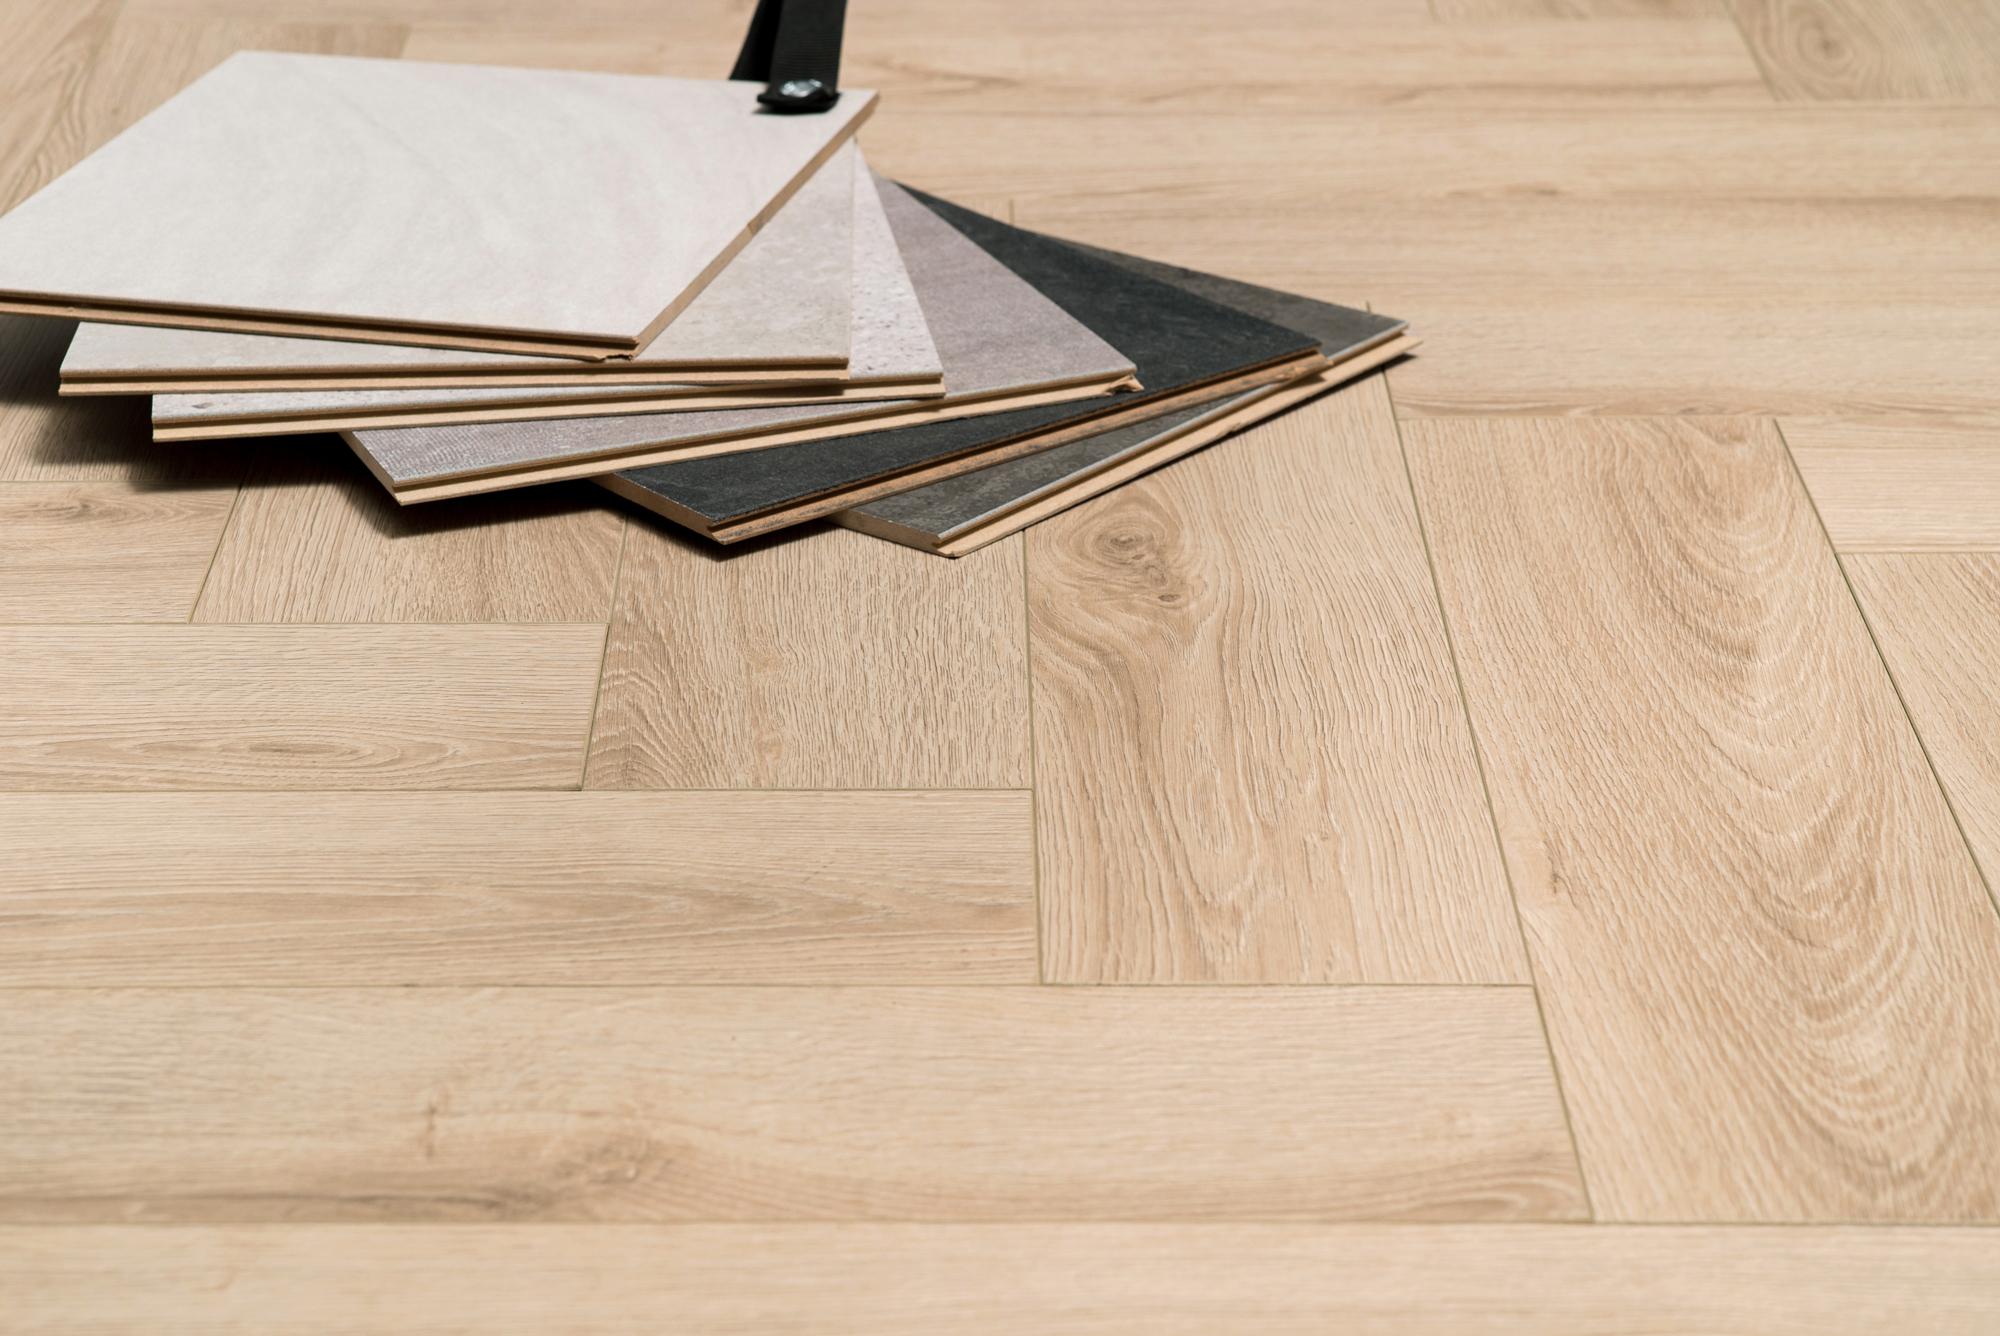 Laminaat Visgraat Leggen : Fesca visgraat laminaat natuur eiken vloer patroon eik ac 6